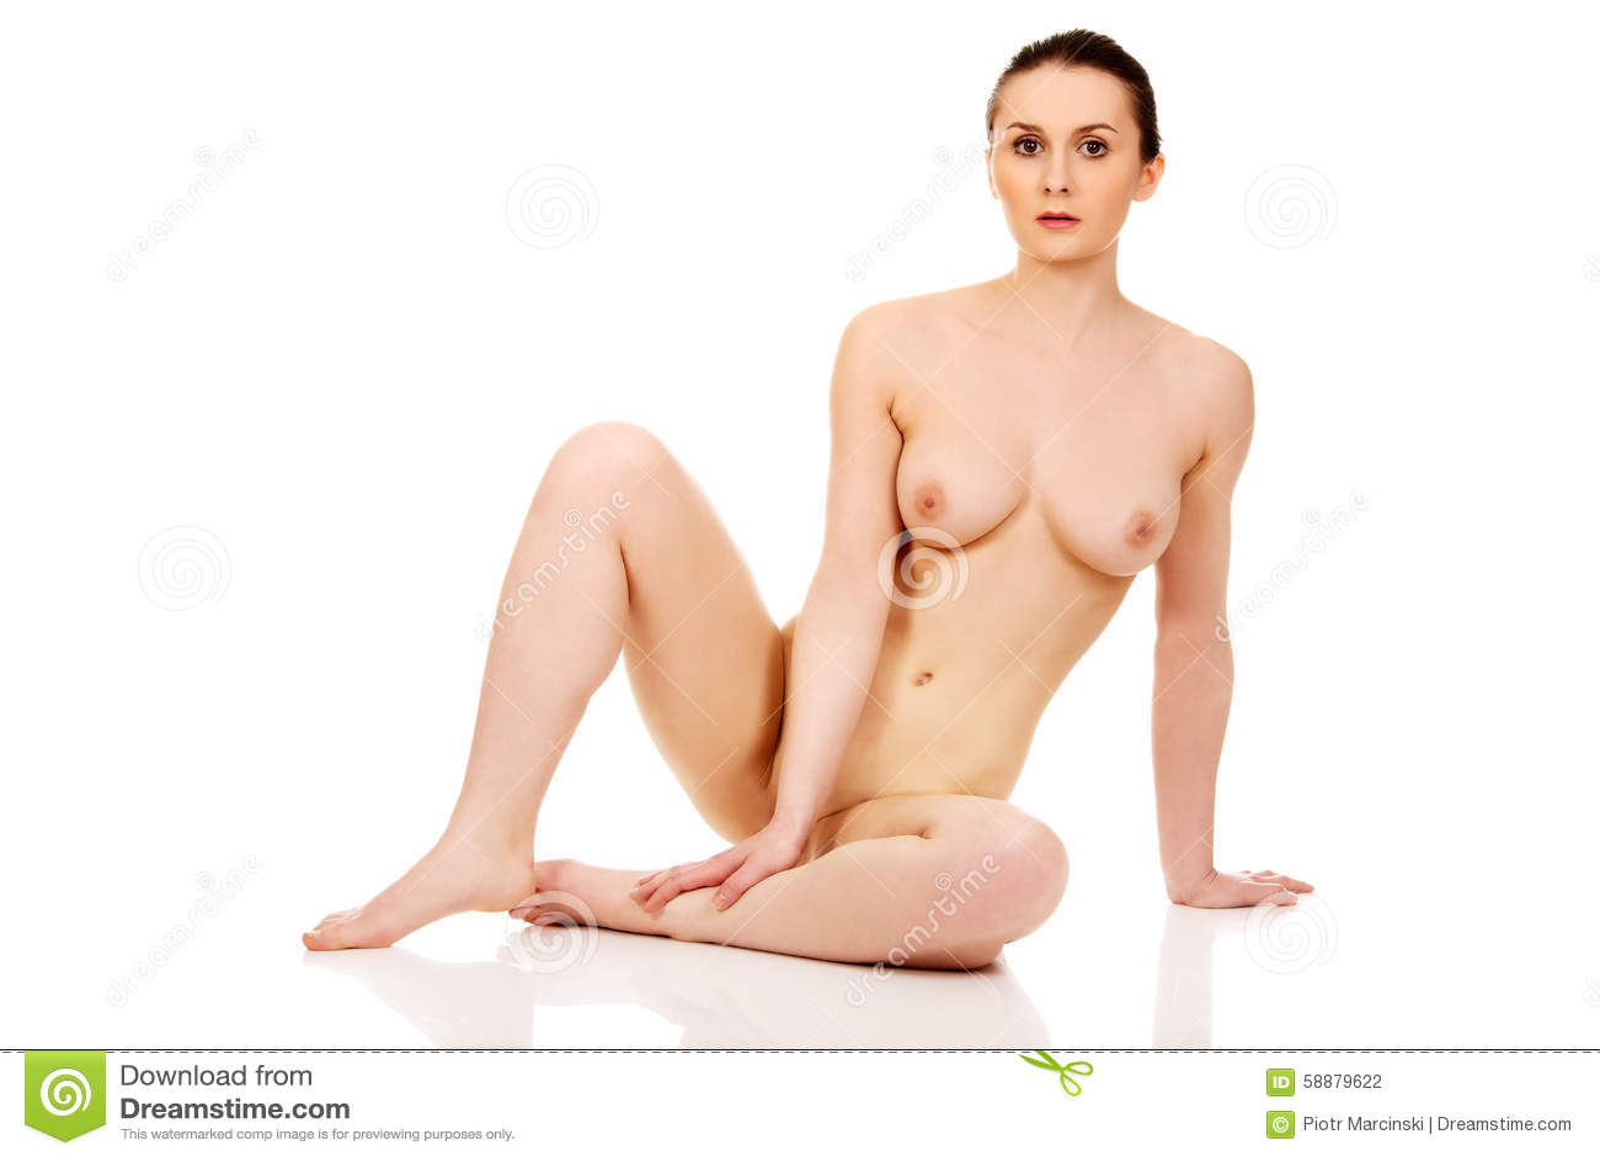 cheating swingers wife nude